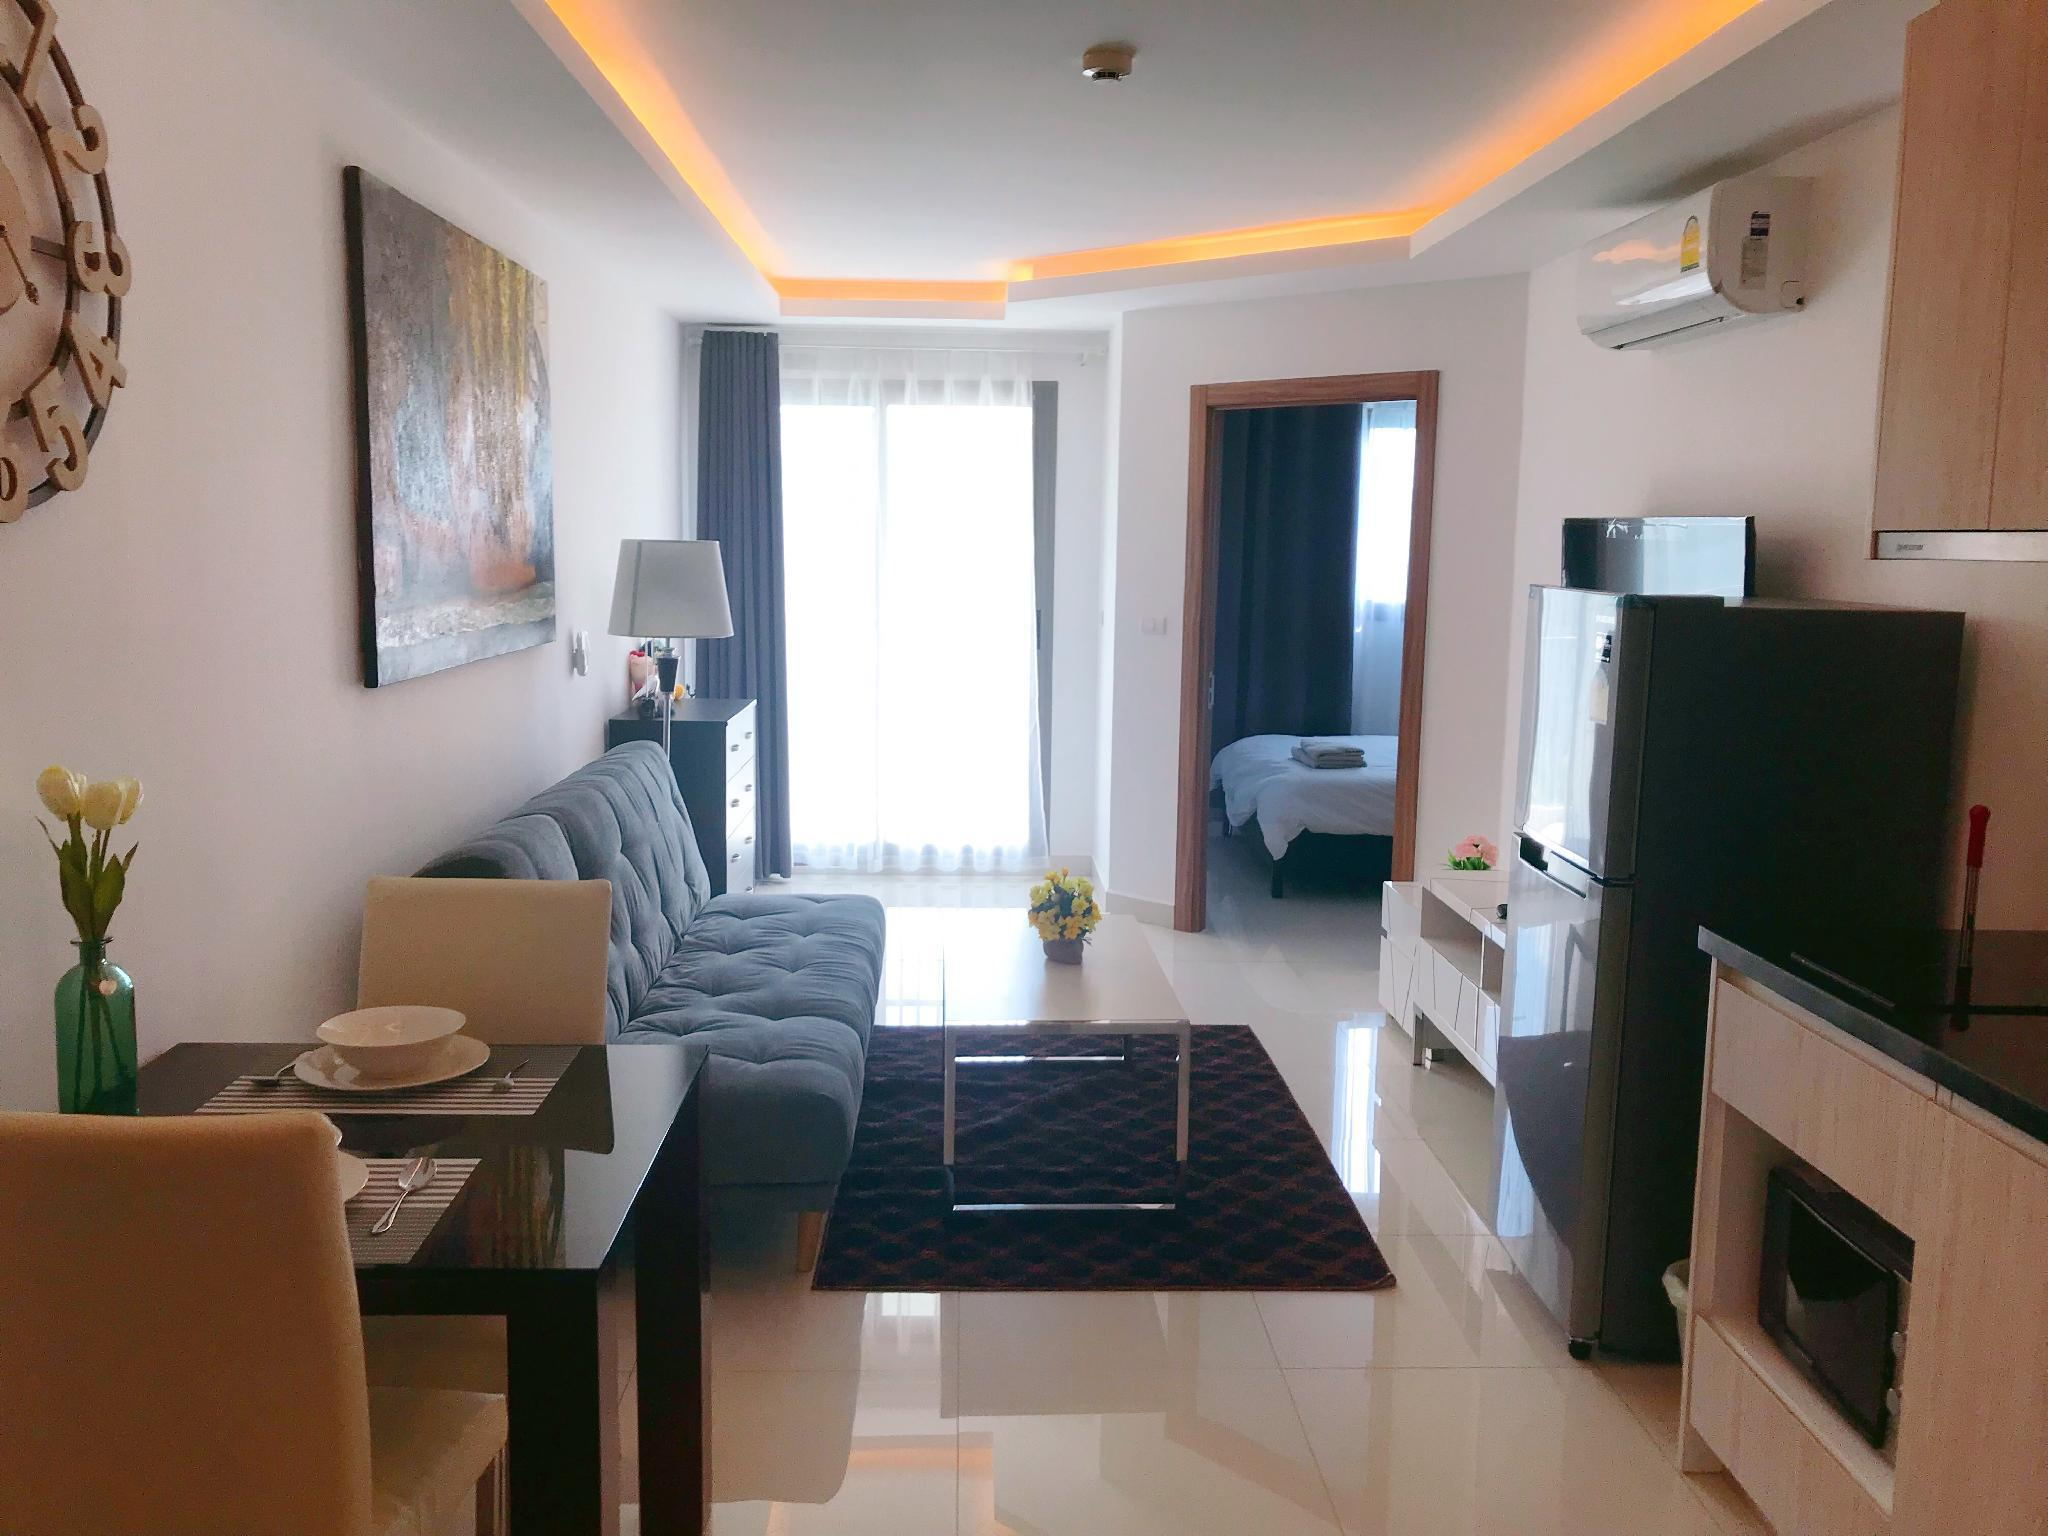 One Bed Room Laguan Beach Resort 3   Maldives